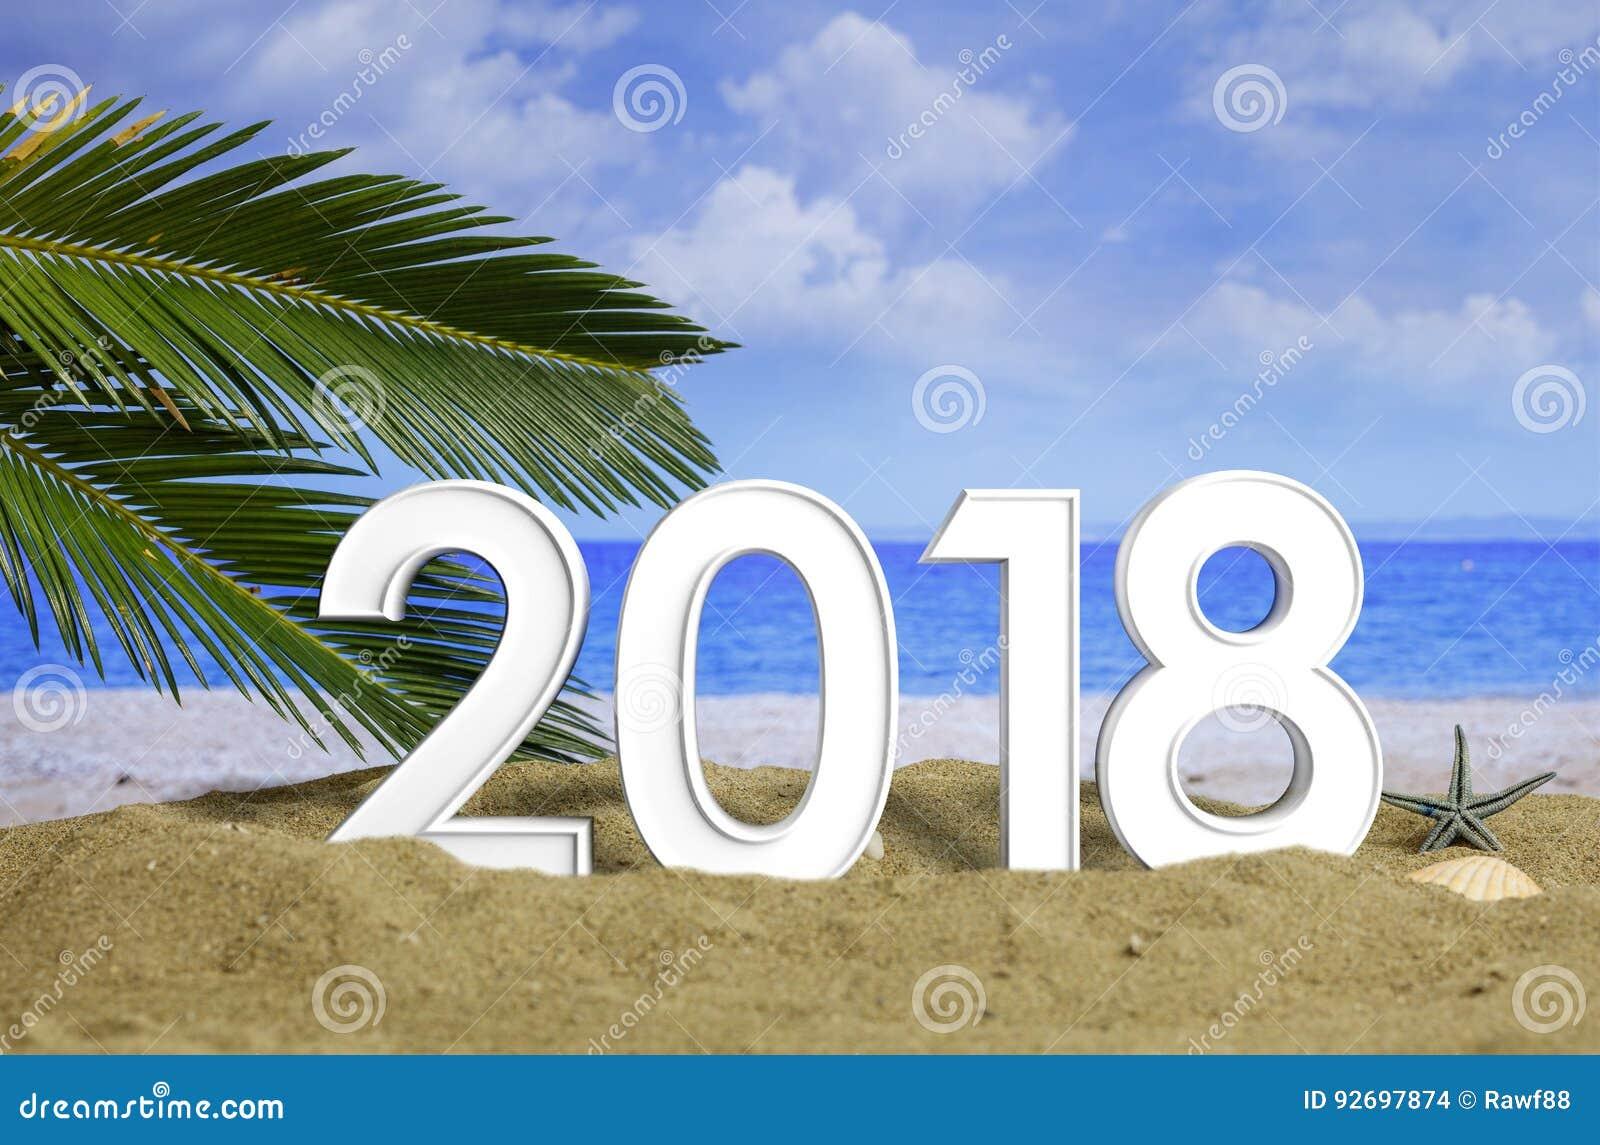 new year 2018 celebration on the beach 3d illustration